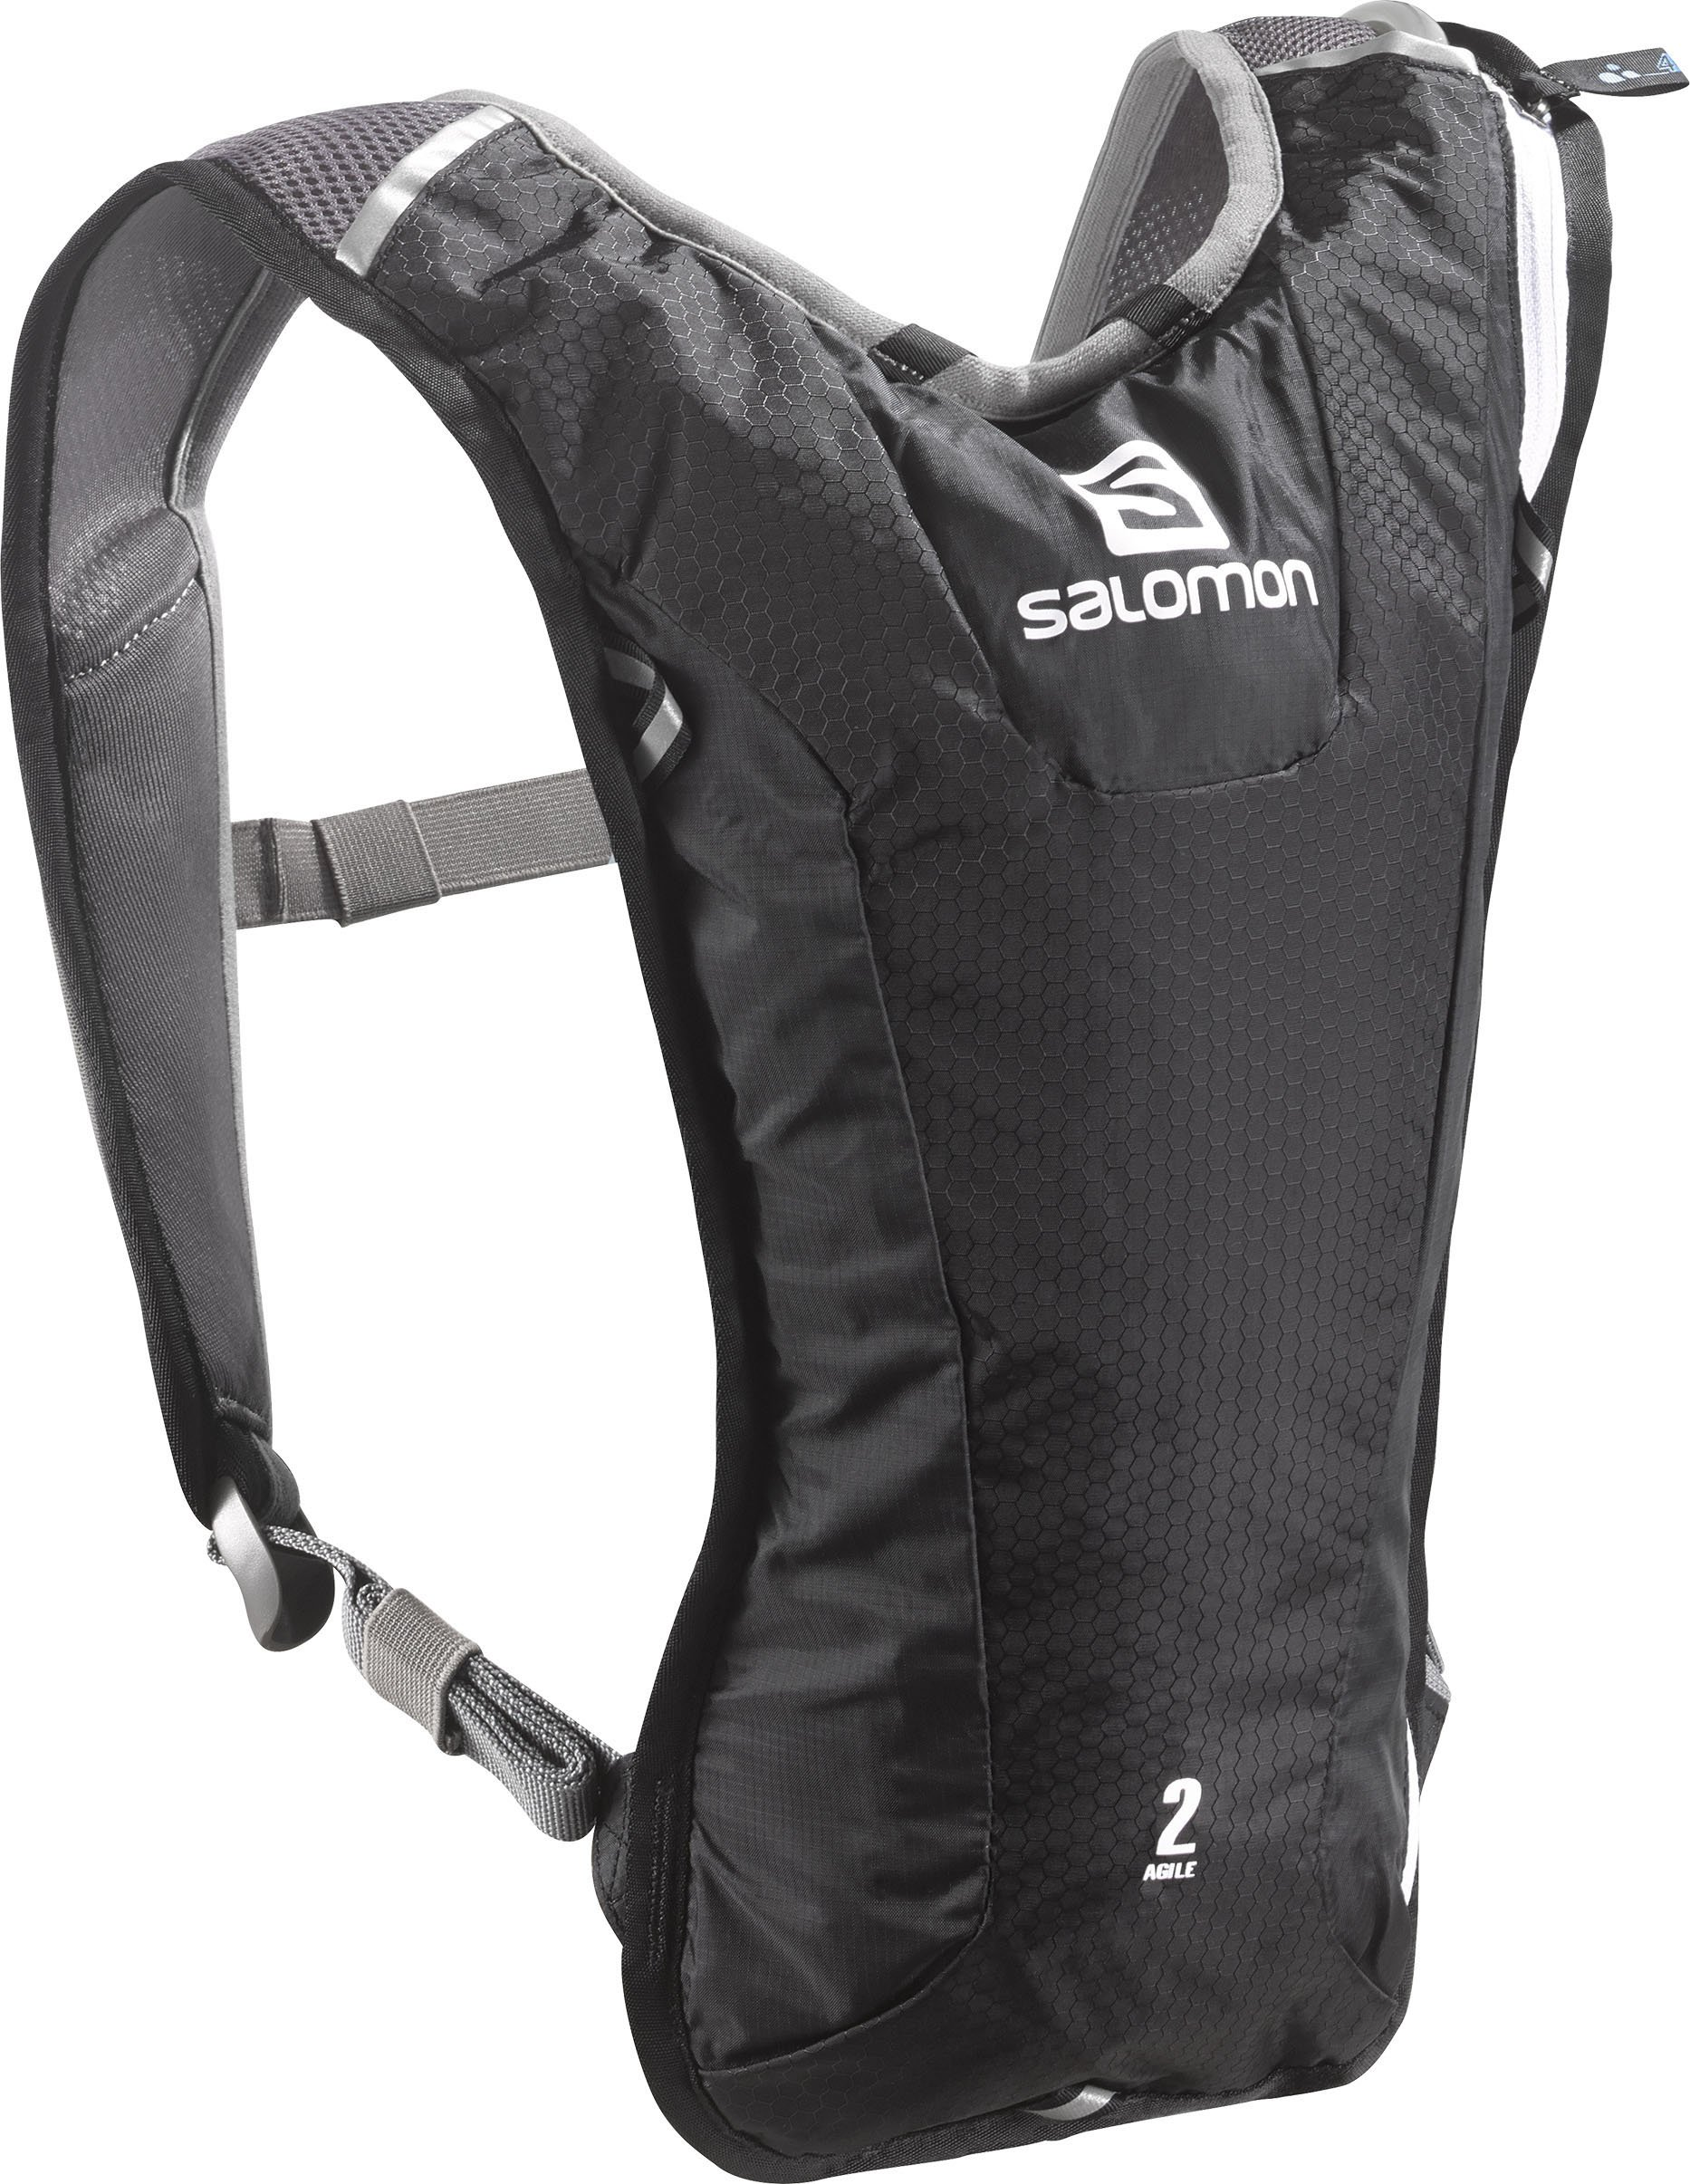 Batoh Salomon Agile 2 SET